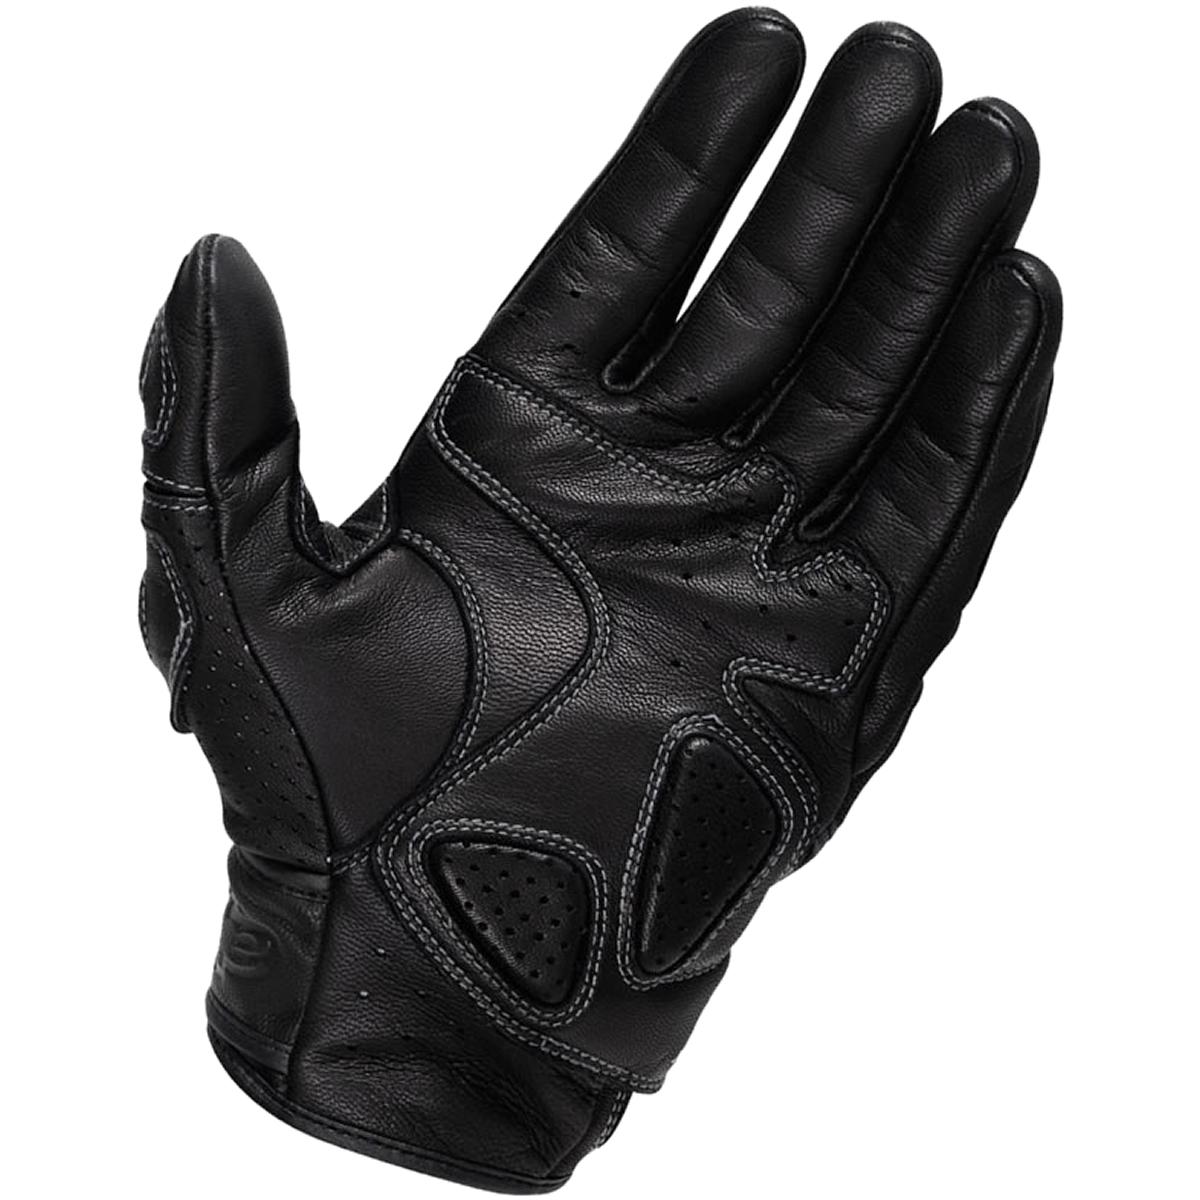 Motorcycle gloves cruiser -  Alpinestars Sps Short Summer Leather Sports Cruiser Motorbike Motorcycle Gloves Preview 3